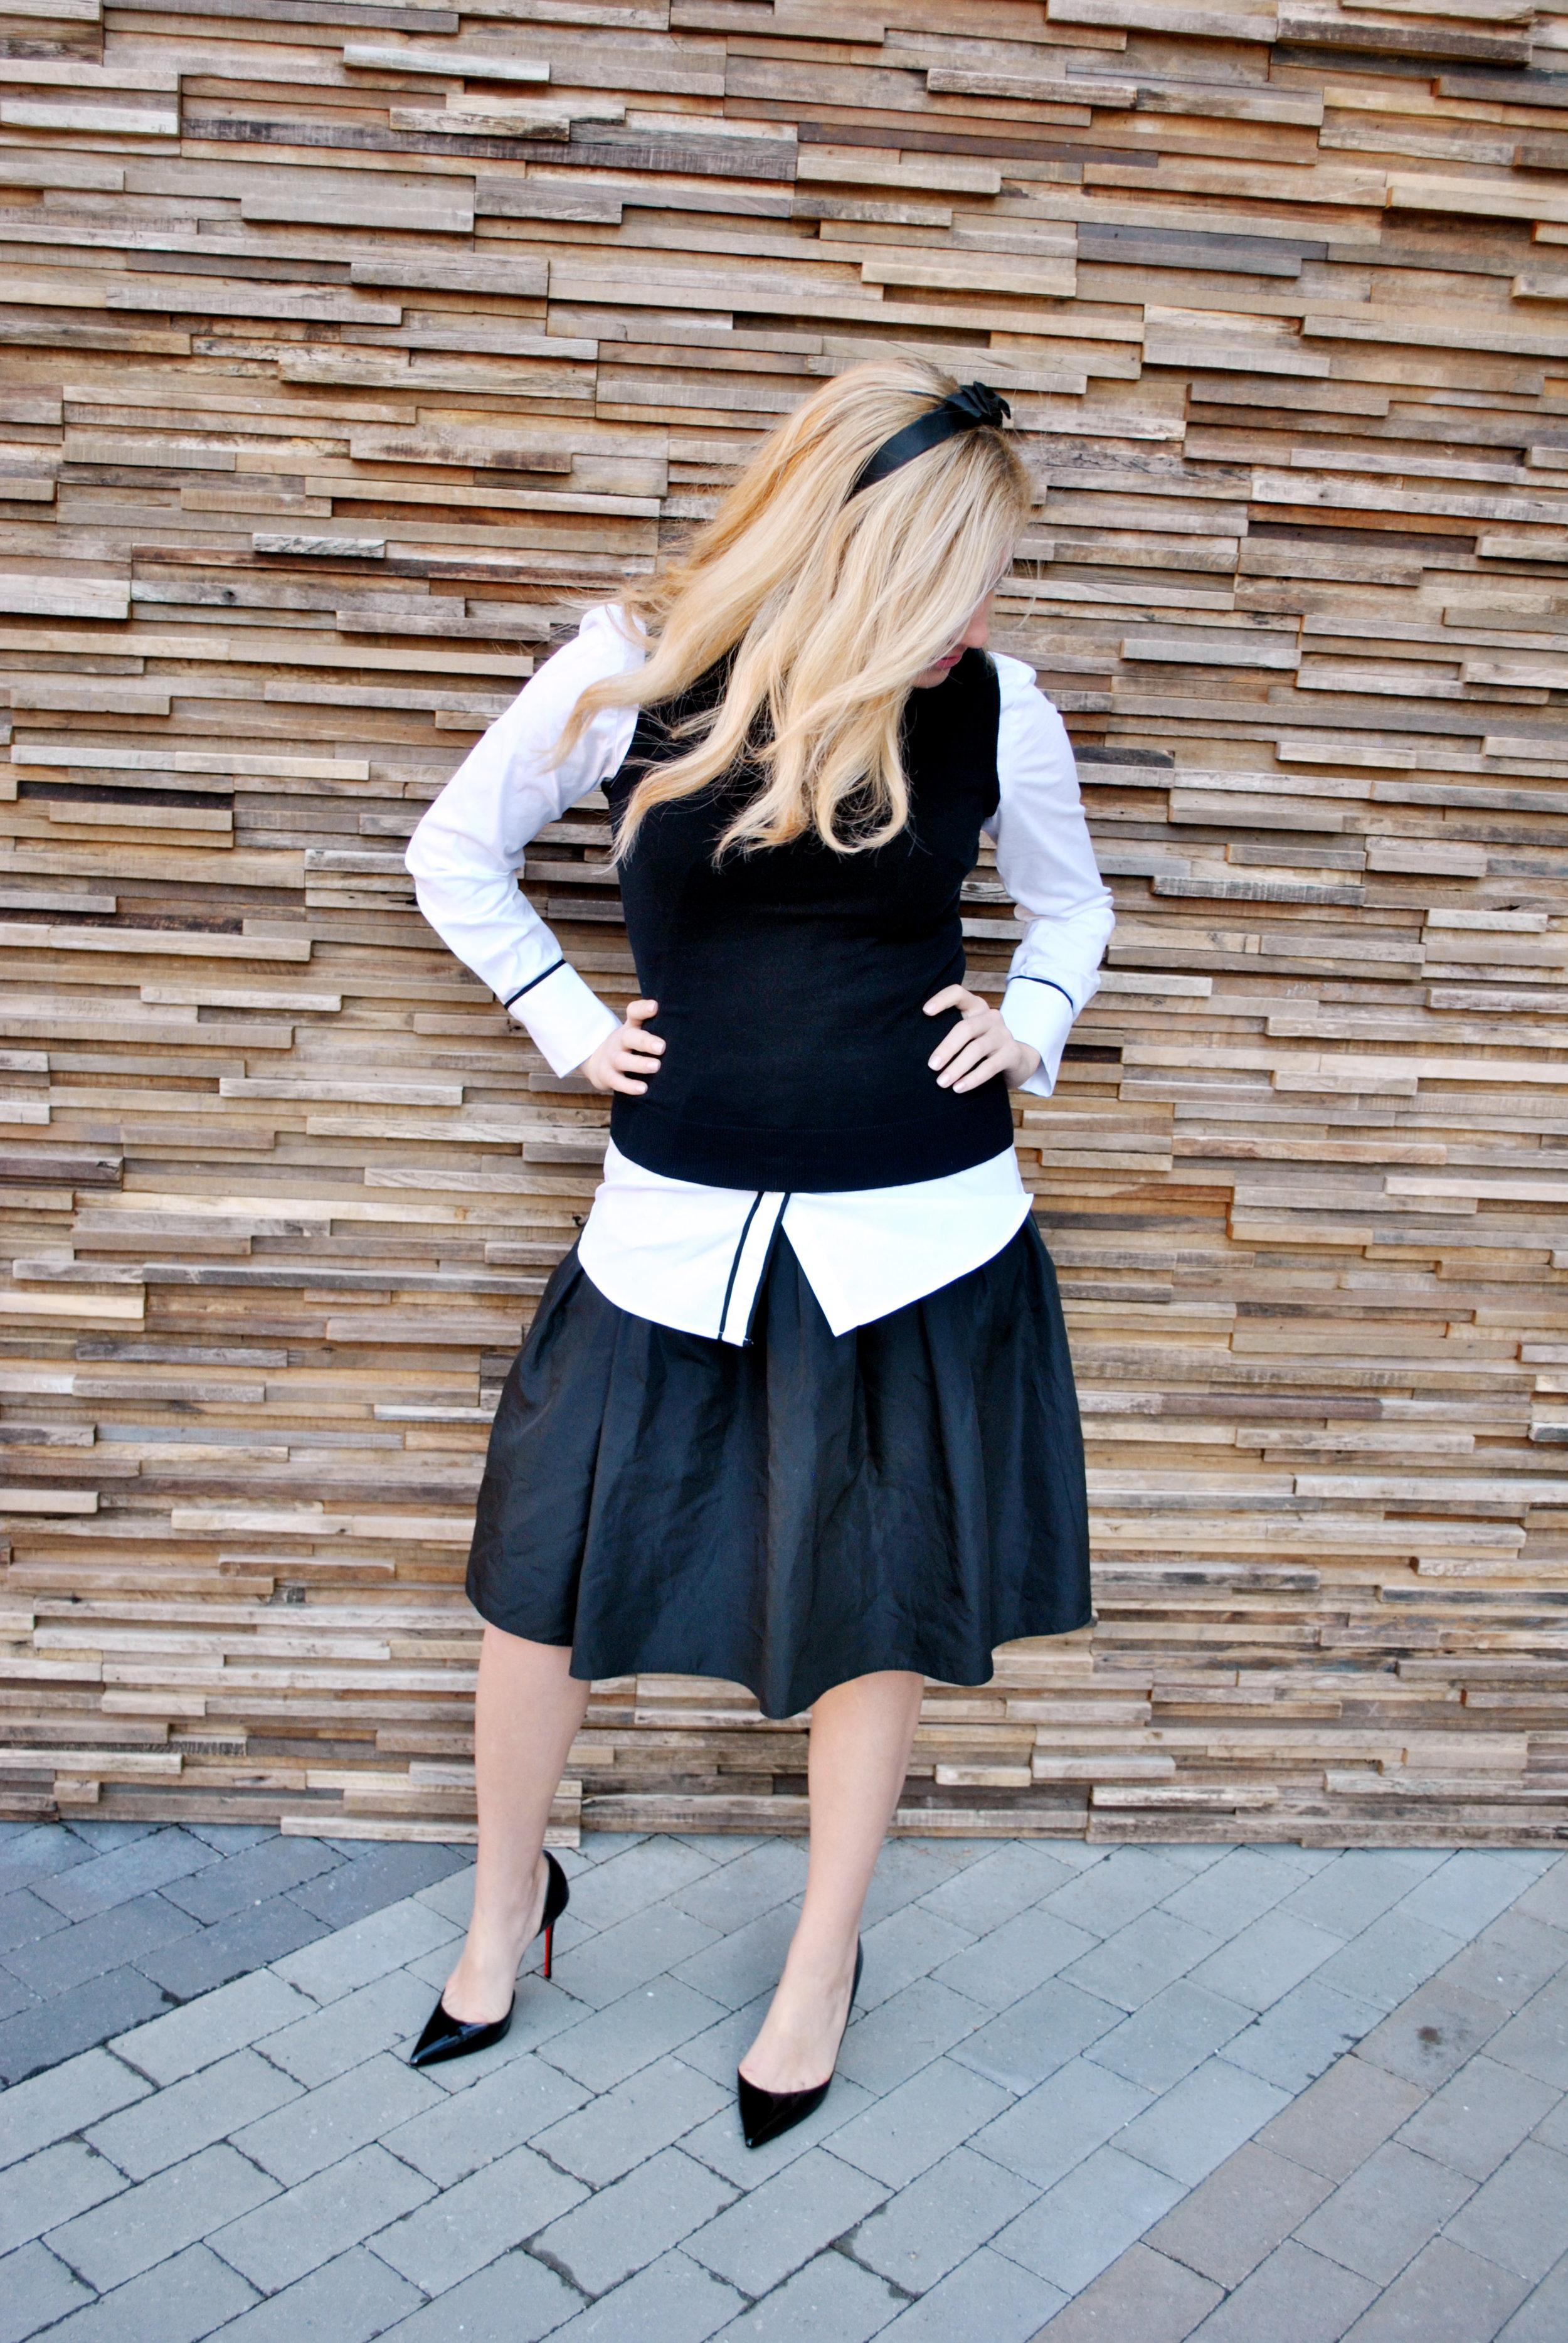 thoughtfulwish | Fashion blogger, fblog, fashion, black and white outfit, black and white fashion, sweater, j.crew, louboutins, layers, meredith wish, boston, work outfit